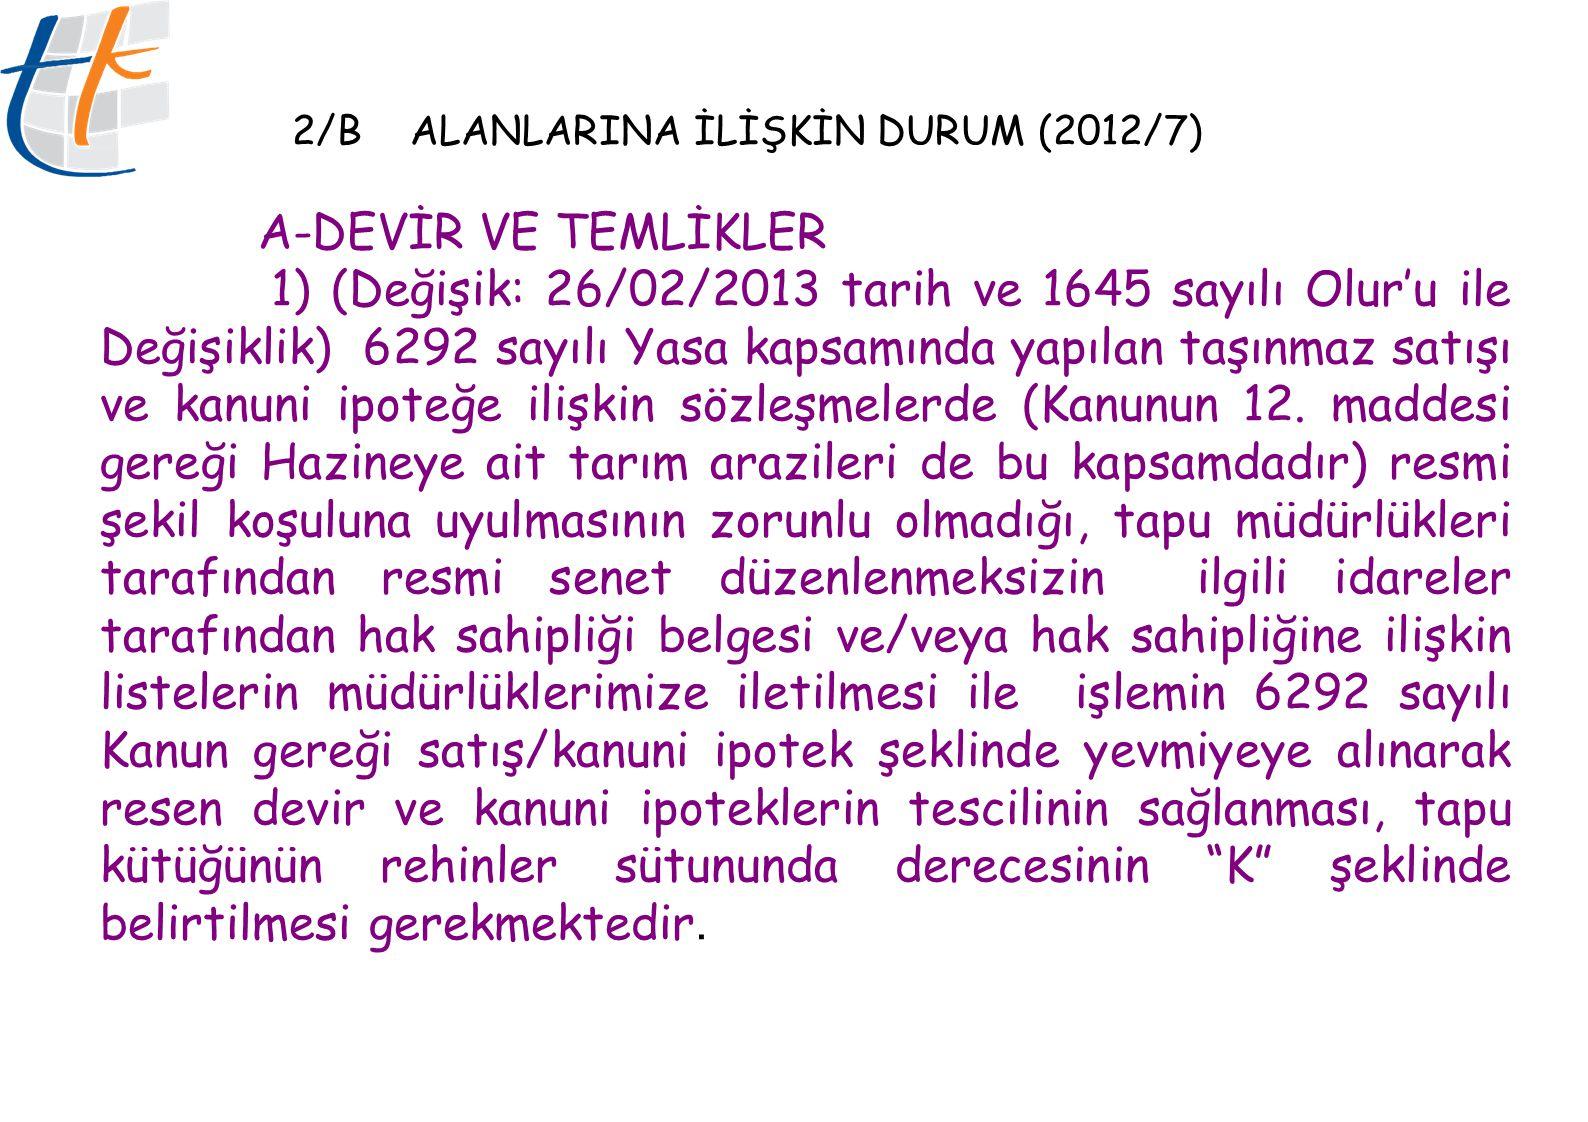 2/B ALANLARINA İLİŞKİN DURUM (2012/7)